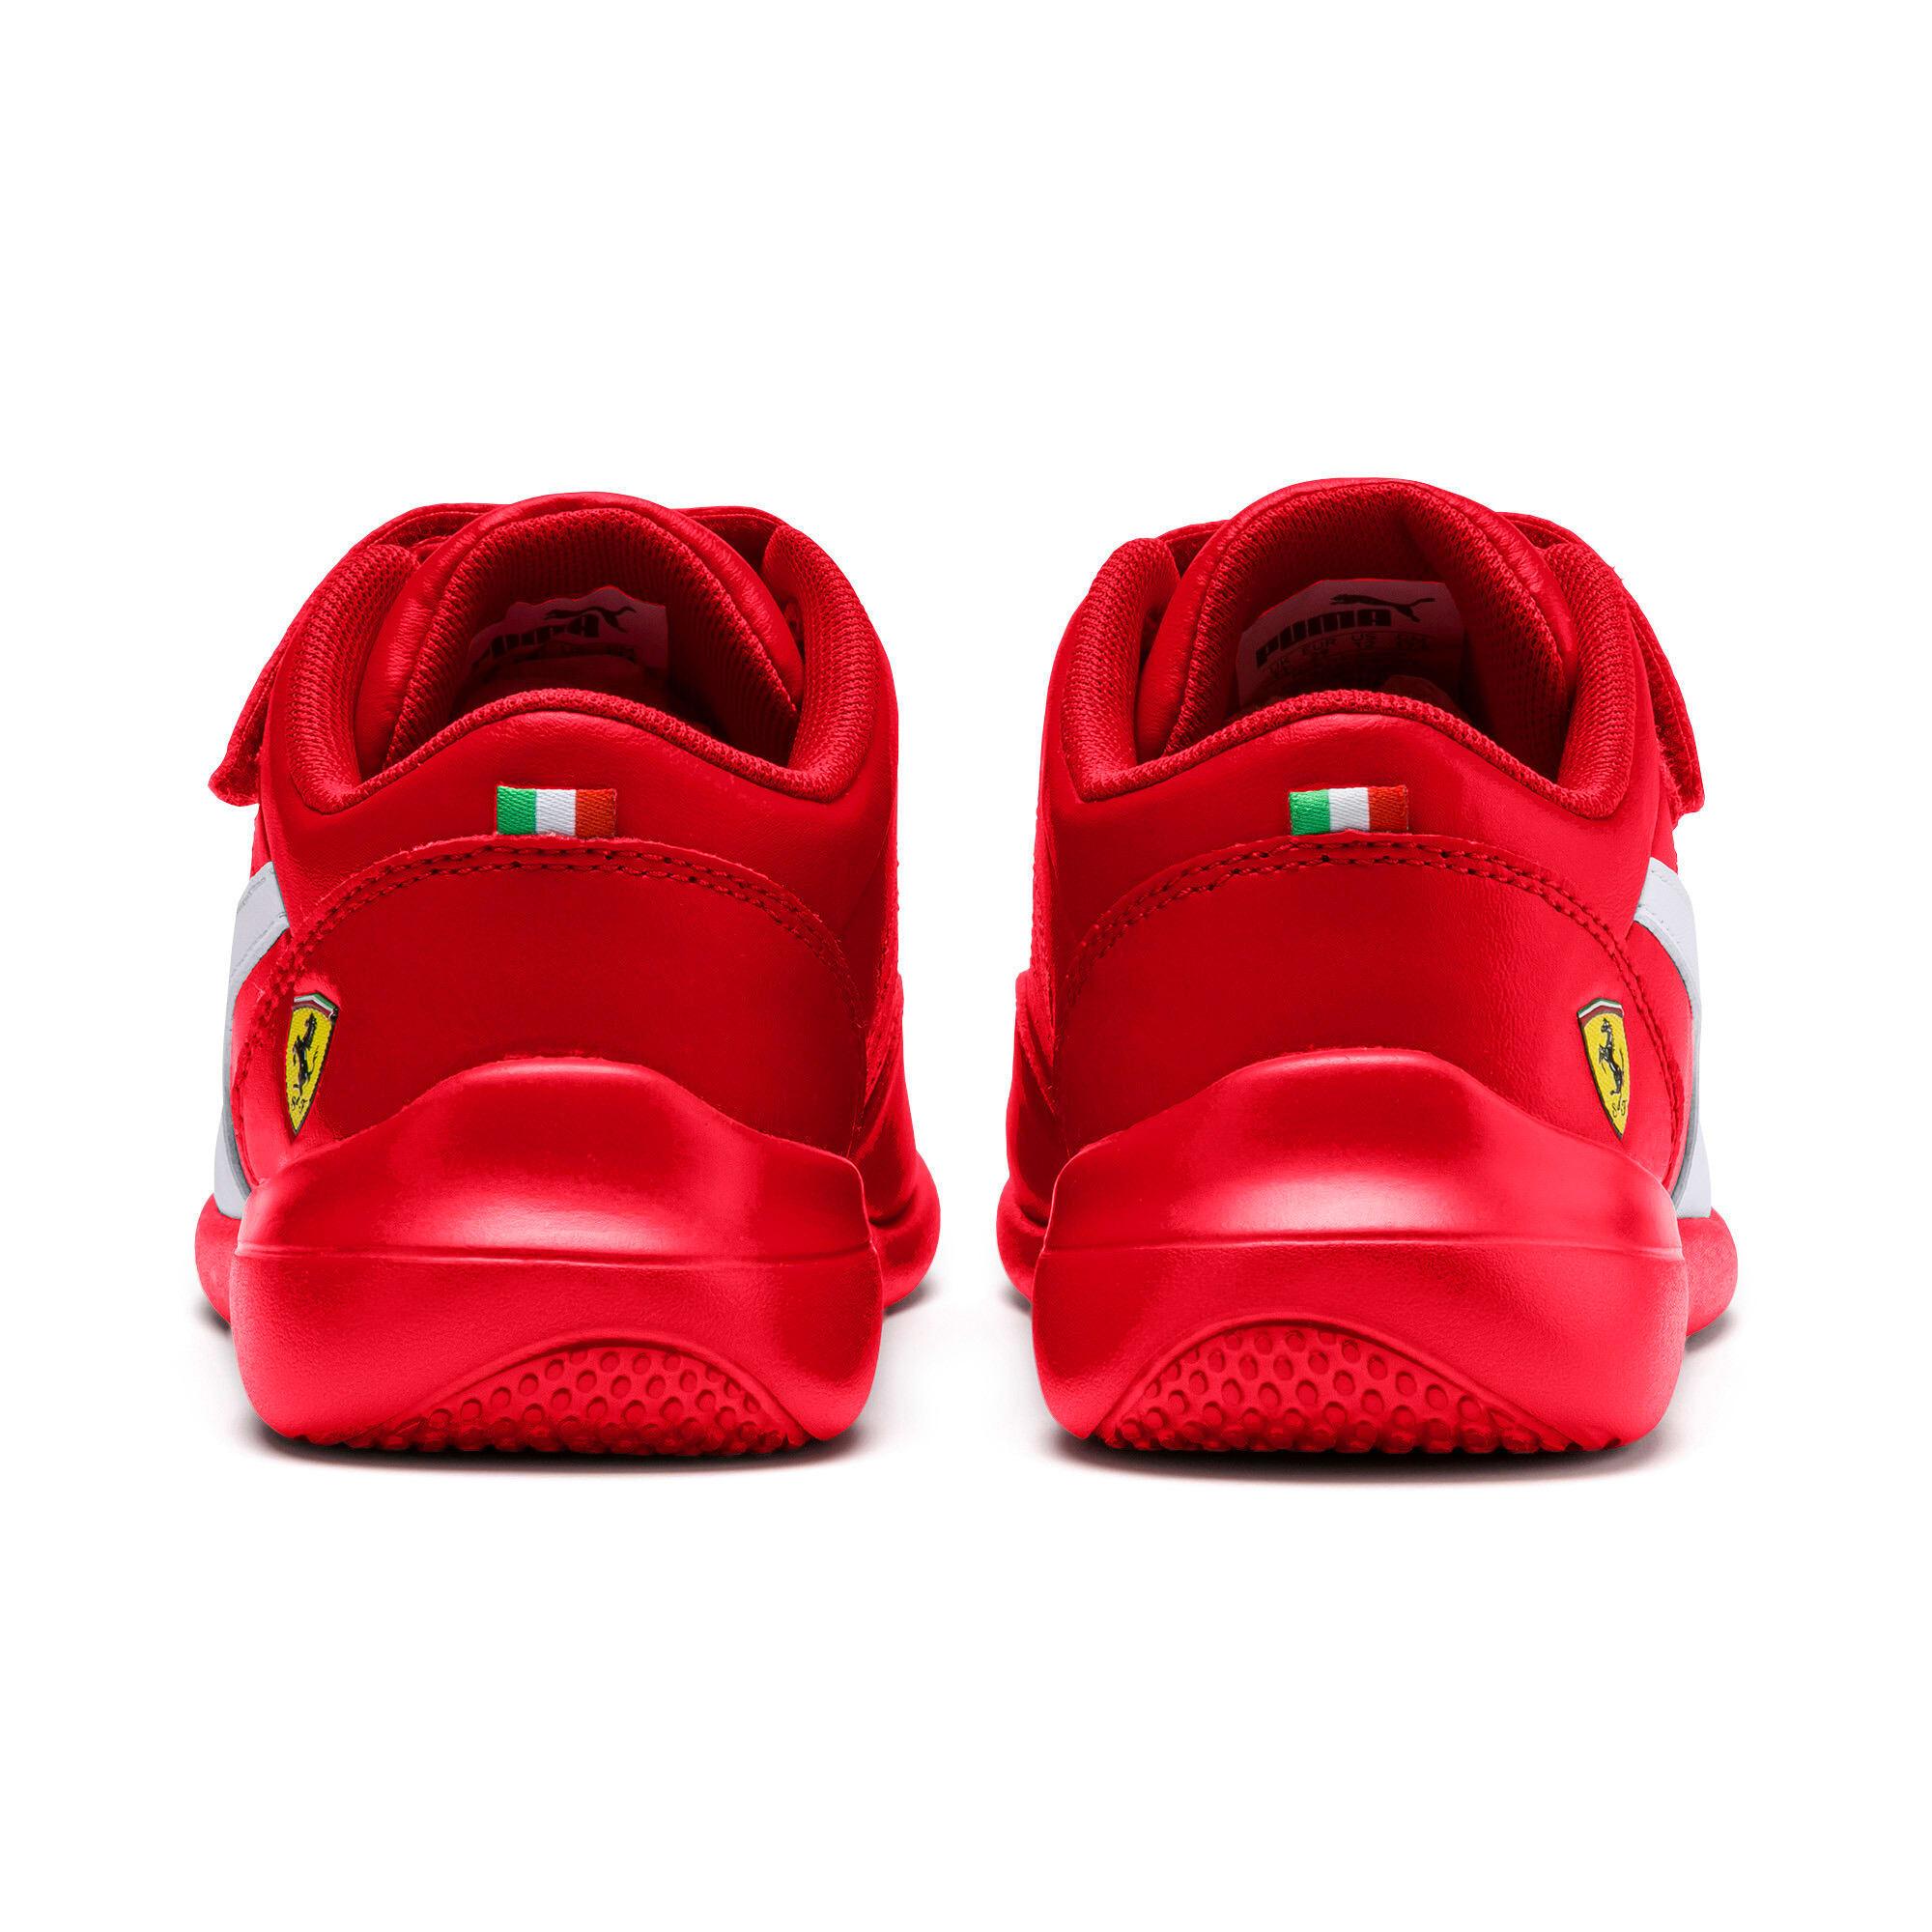 Thumbnail 4 of Ferrari Kart Cat III Kids Sneaker, Rosso Corsa-Wht-Rosso Corsa, medium